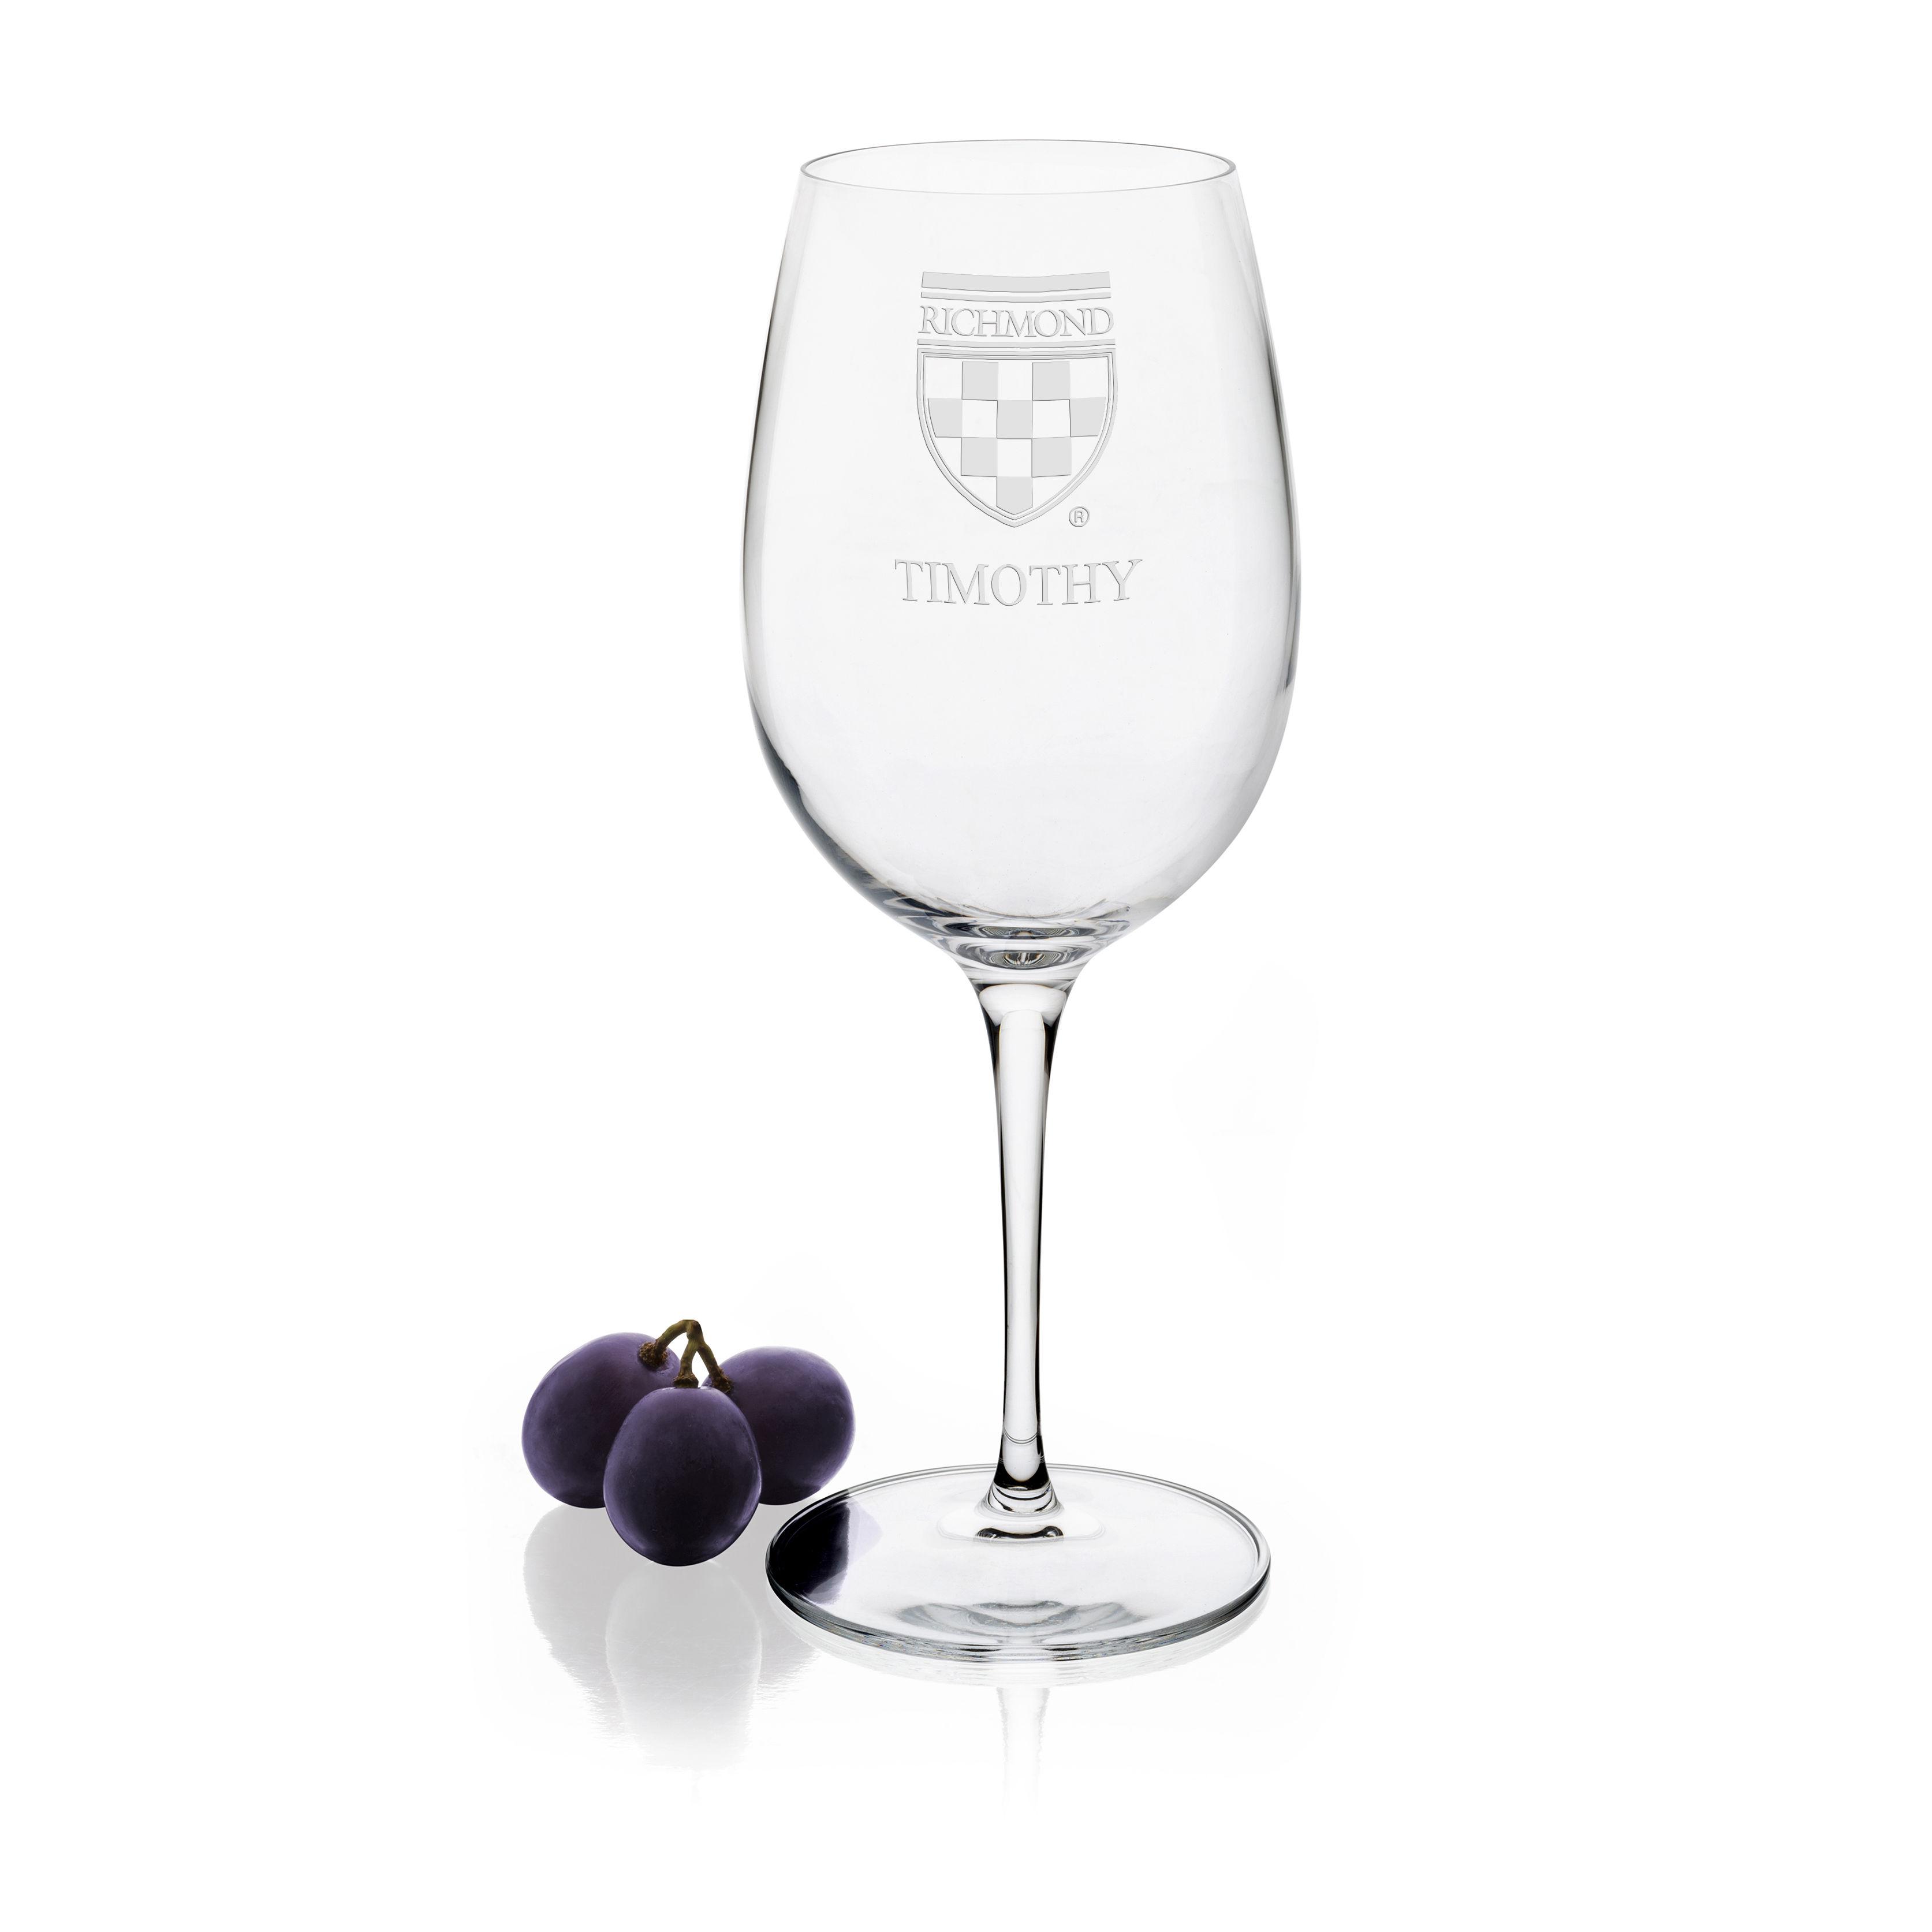 University of Richmond Red Wine Glasses - Set of 2